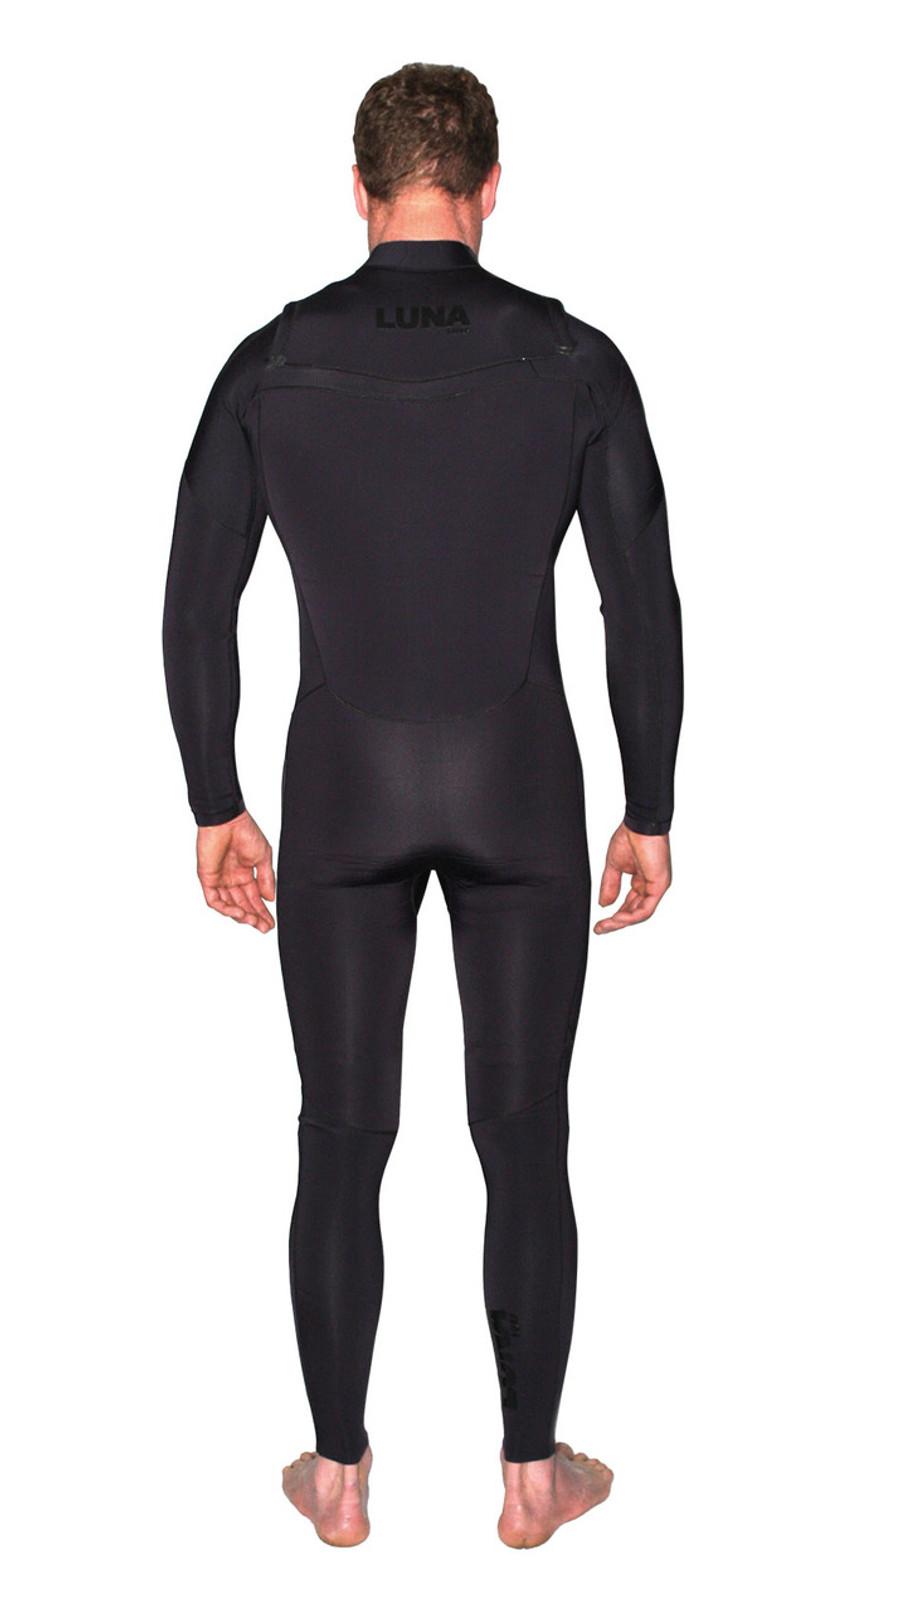 mens 3.2mm wetsuit black stealth